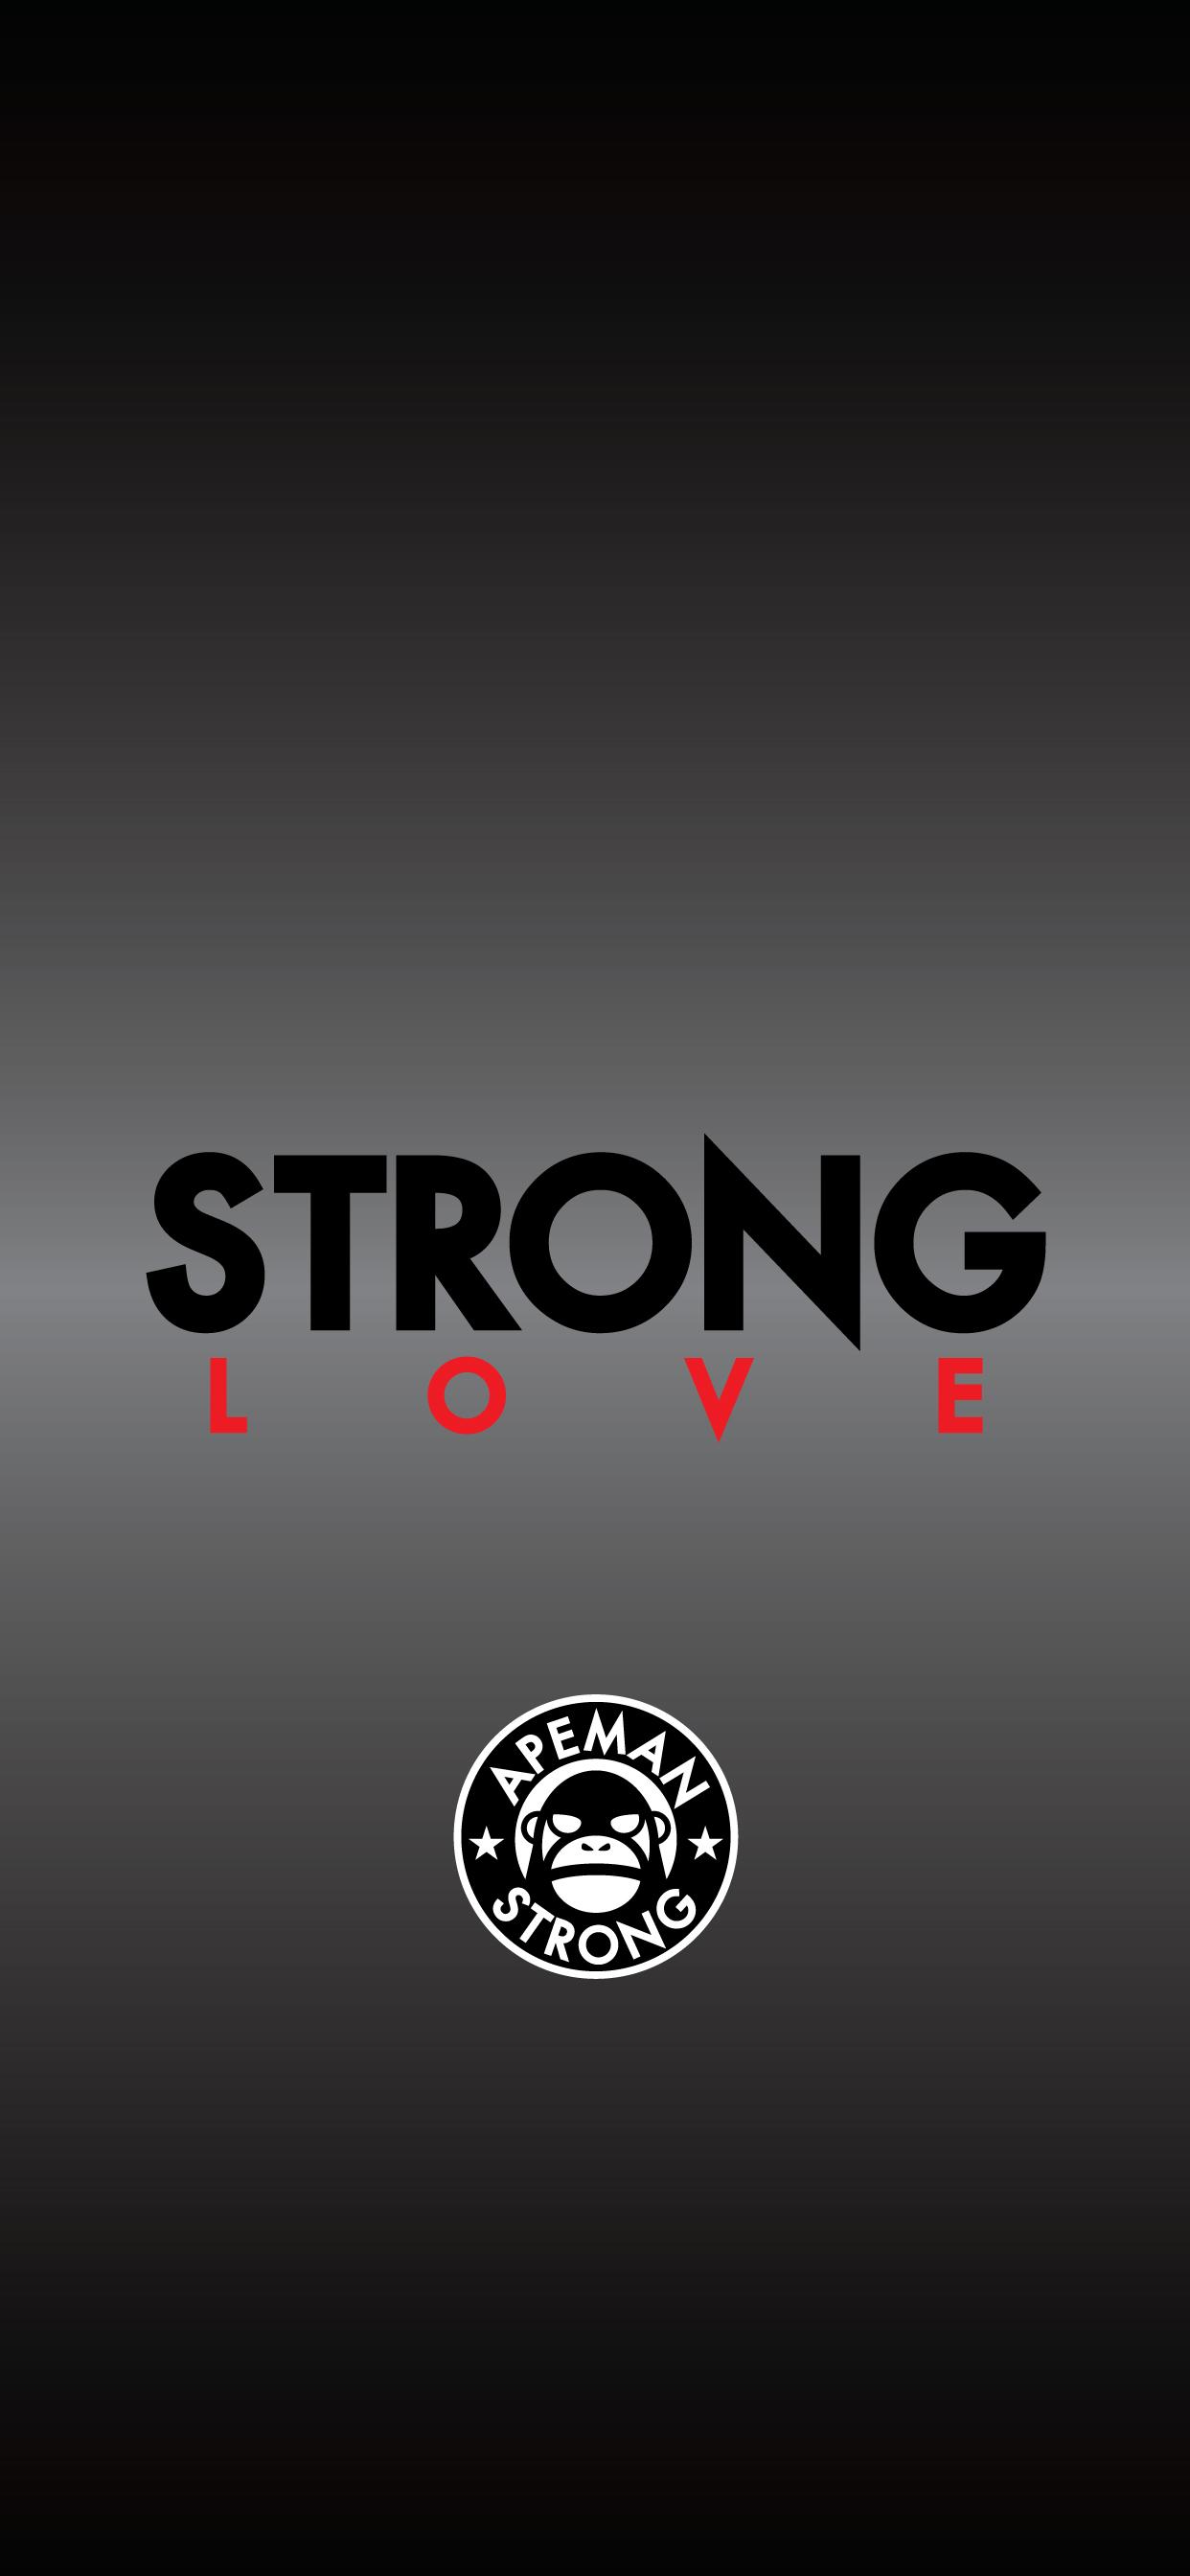 STRONG-LOVE.jpg